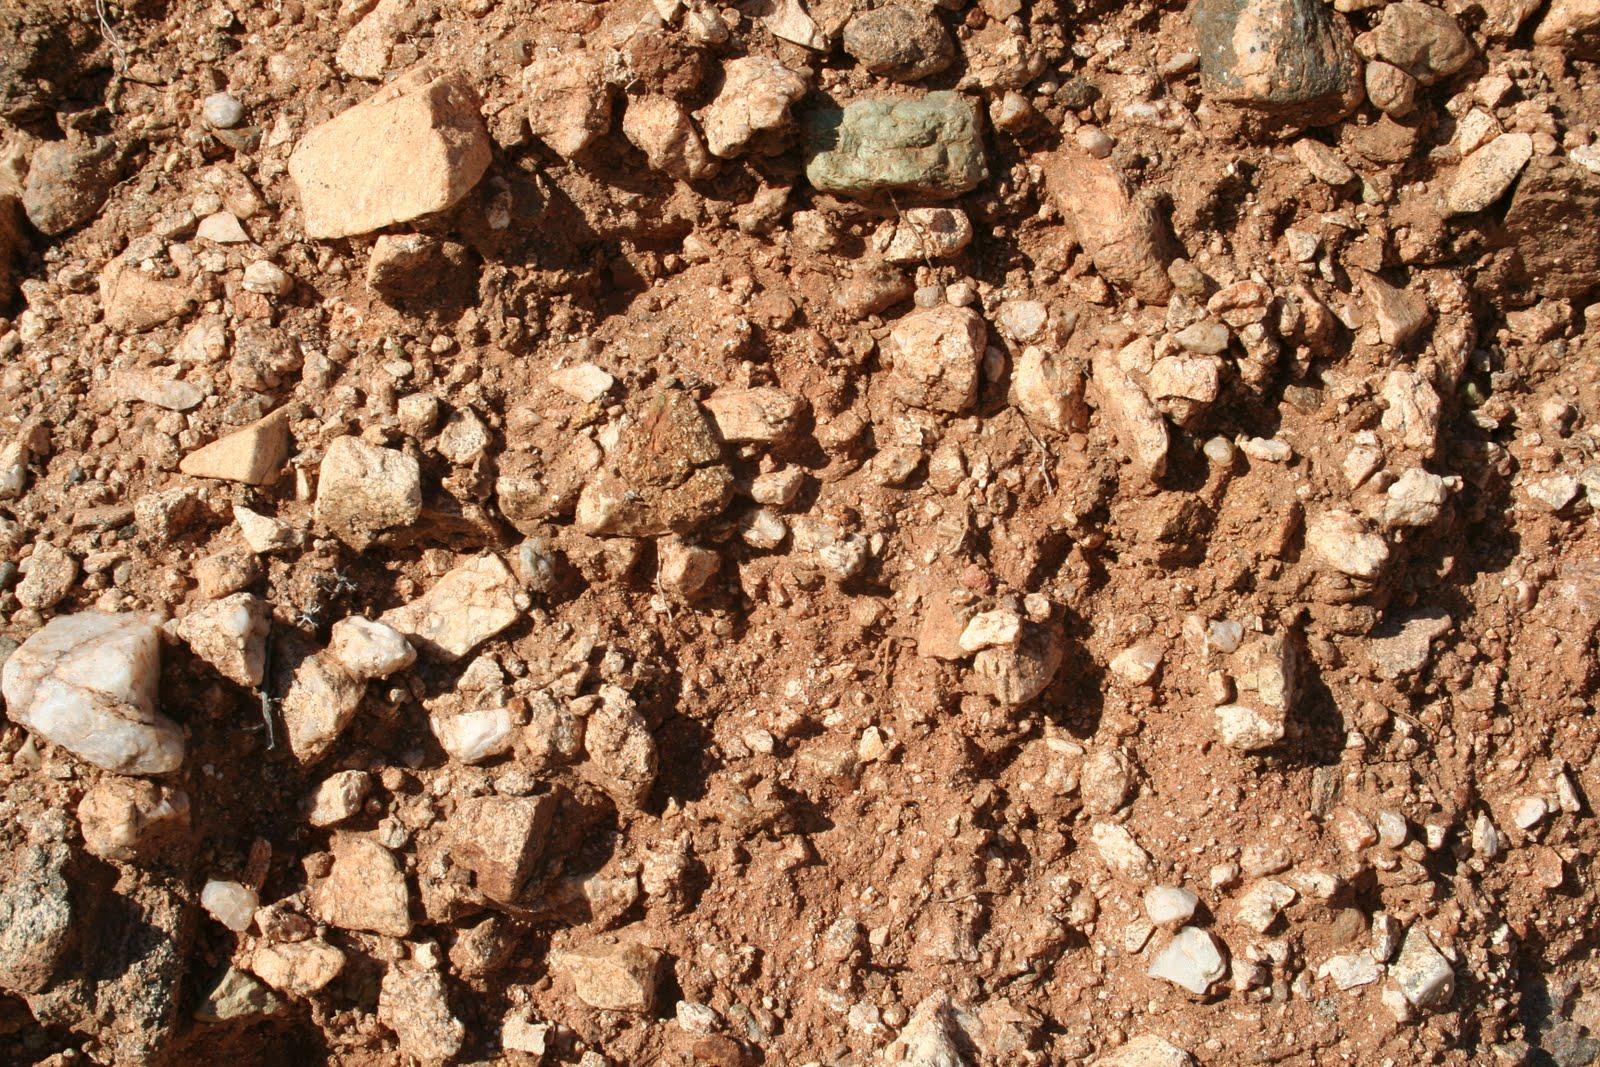 Practical biology science for everyone basic desert soil for What does soil